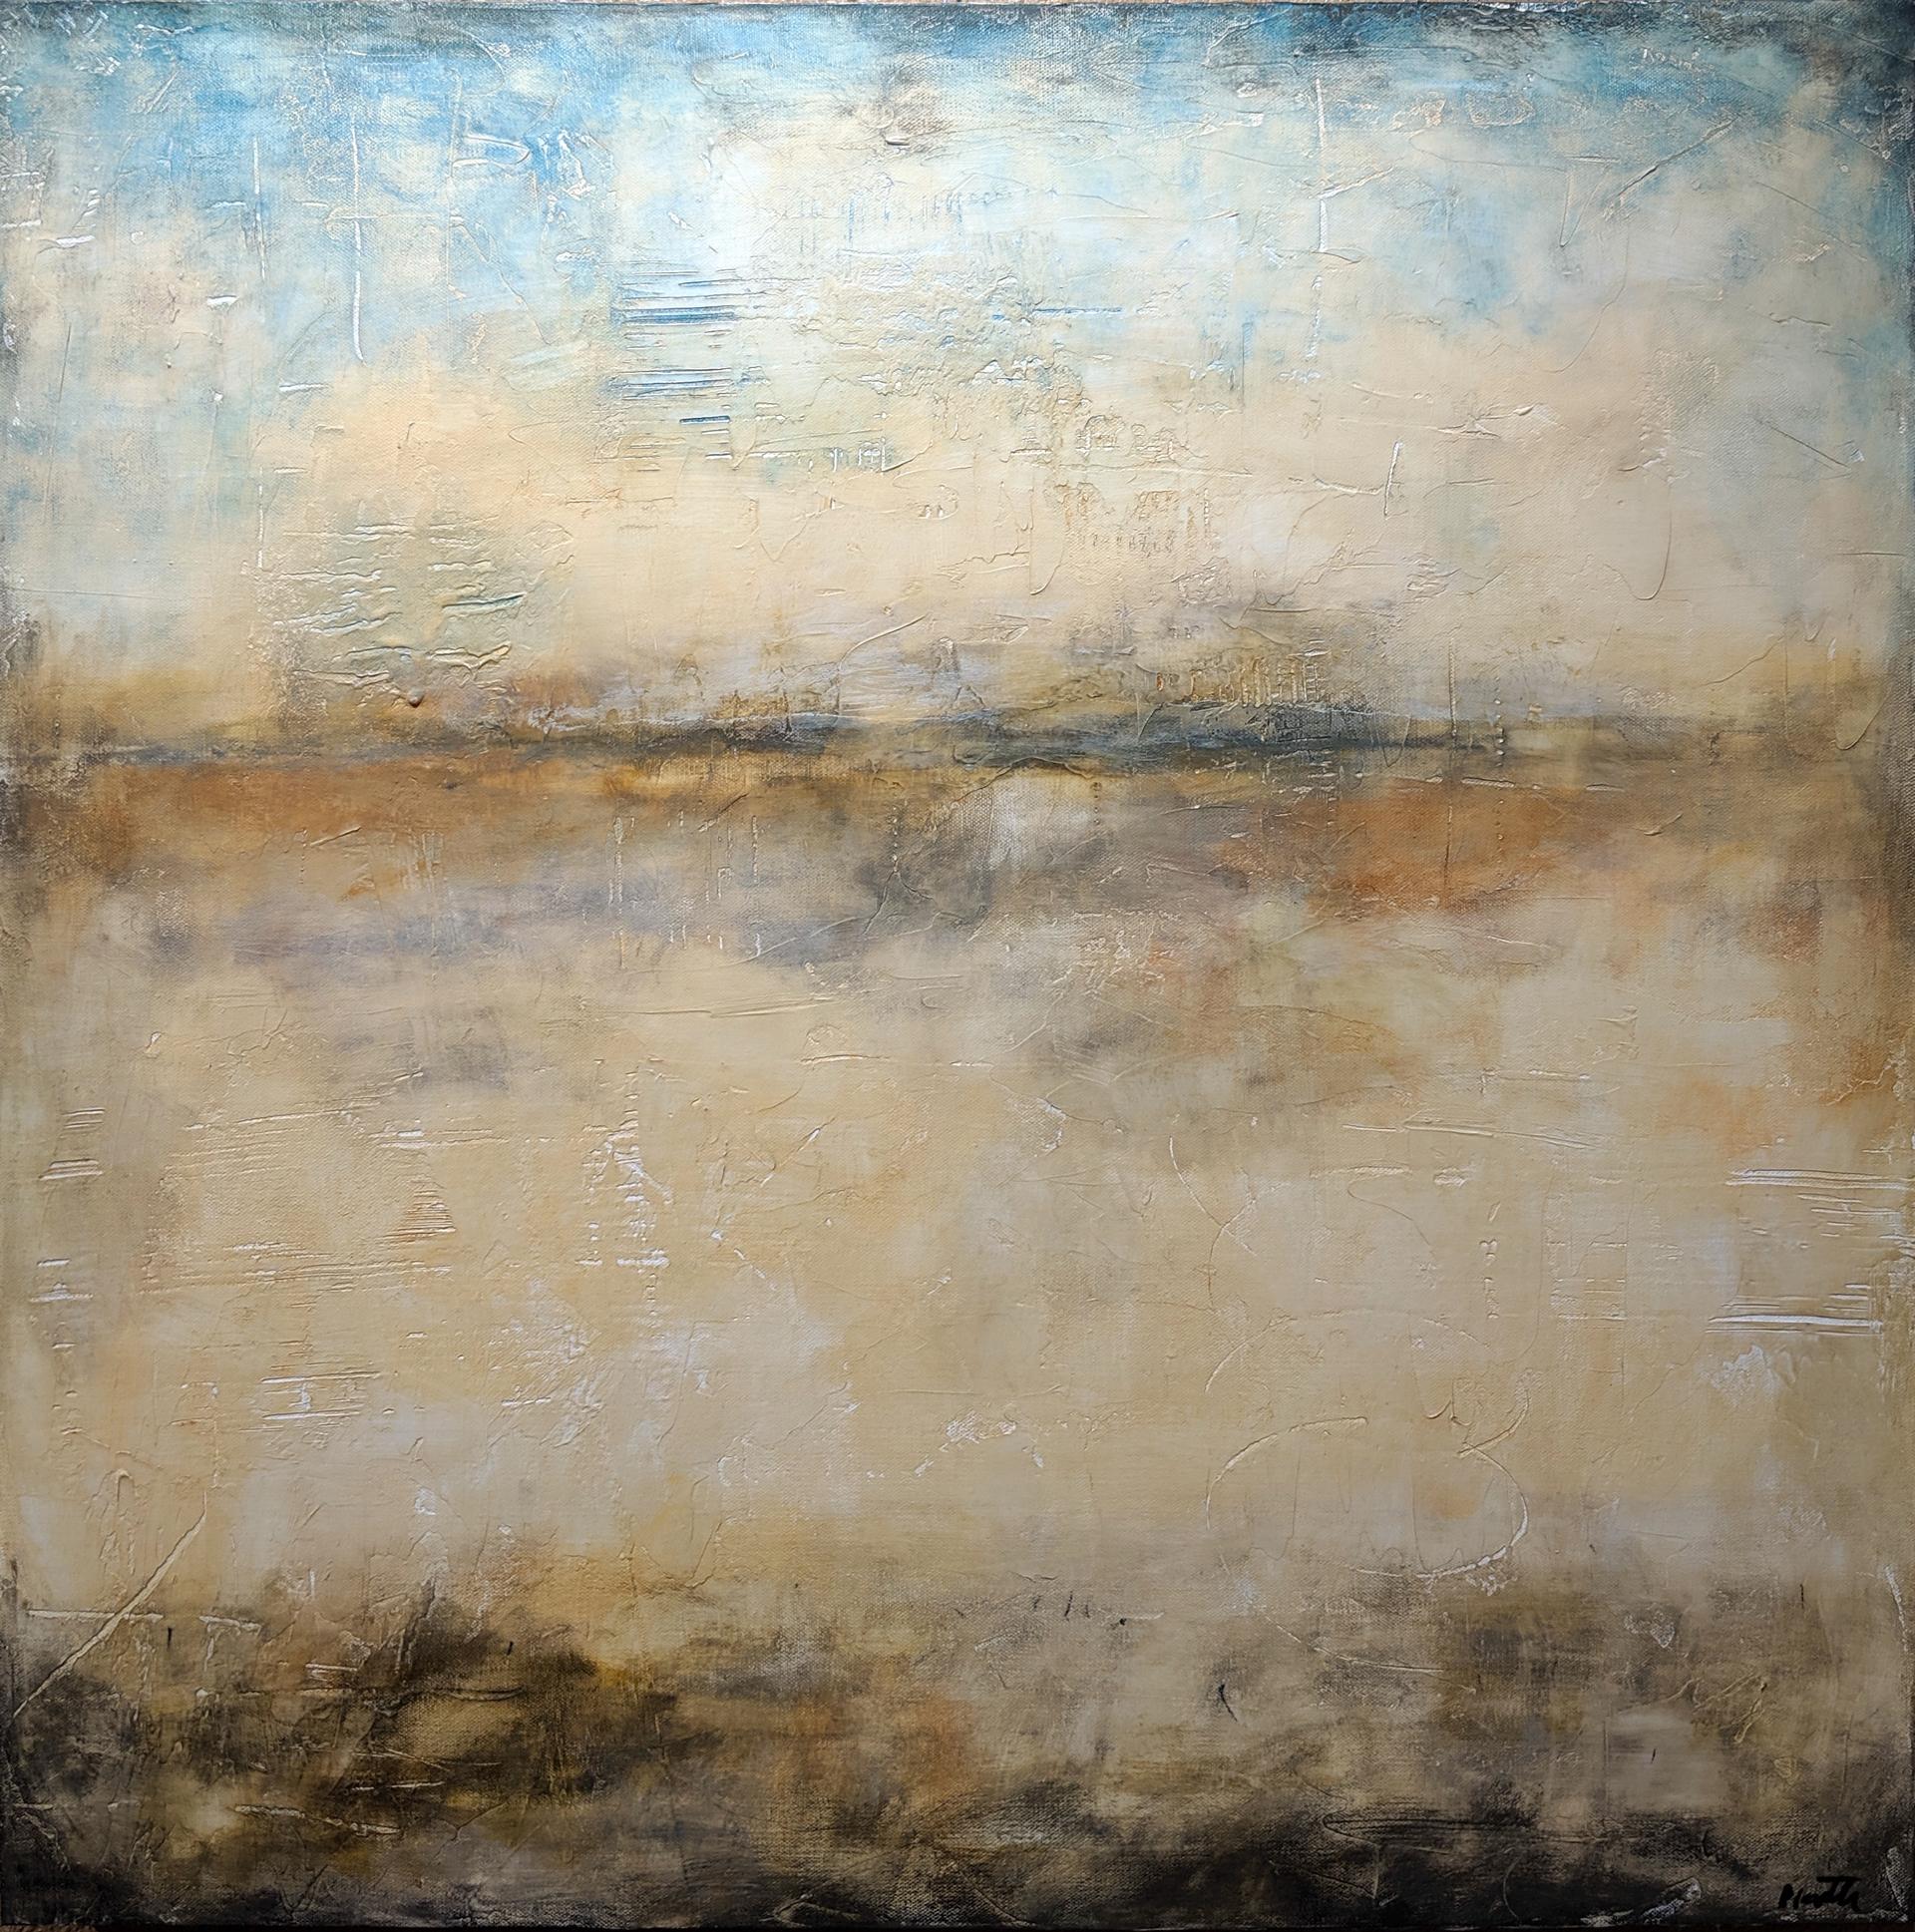 Desert Walk by M. Freeman